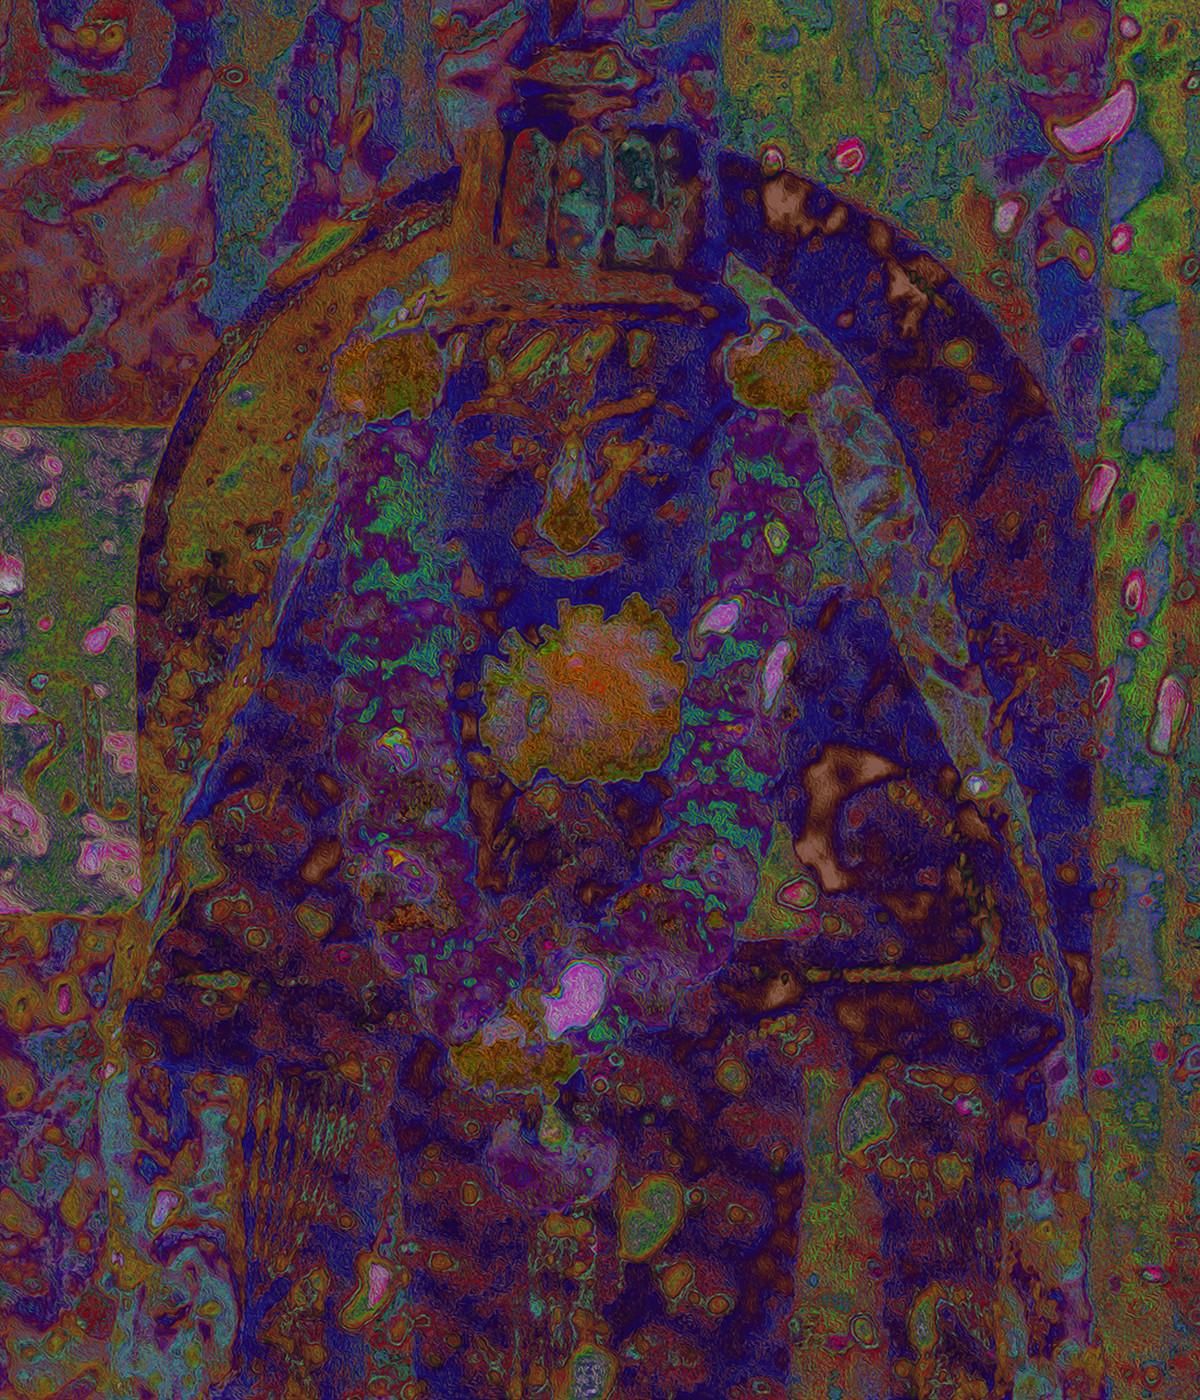 Integration 77 by Ayesha Taleyarkhan, Digital Photography, Digital Print on Canvas, Woody Brown color